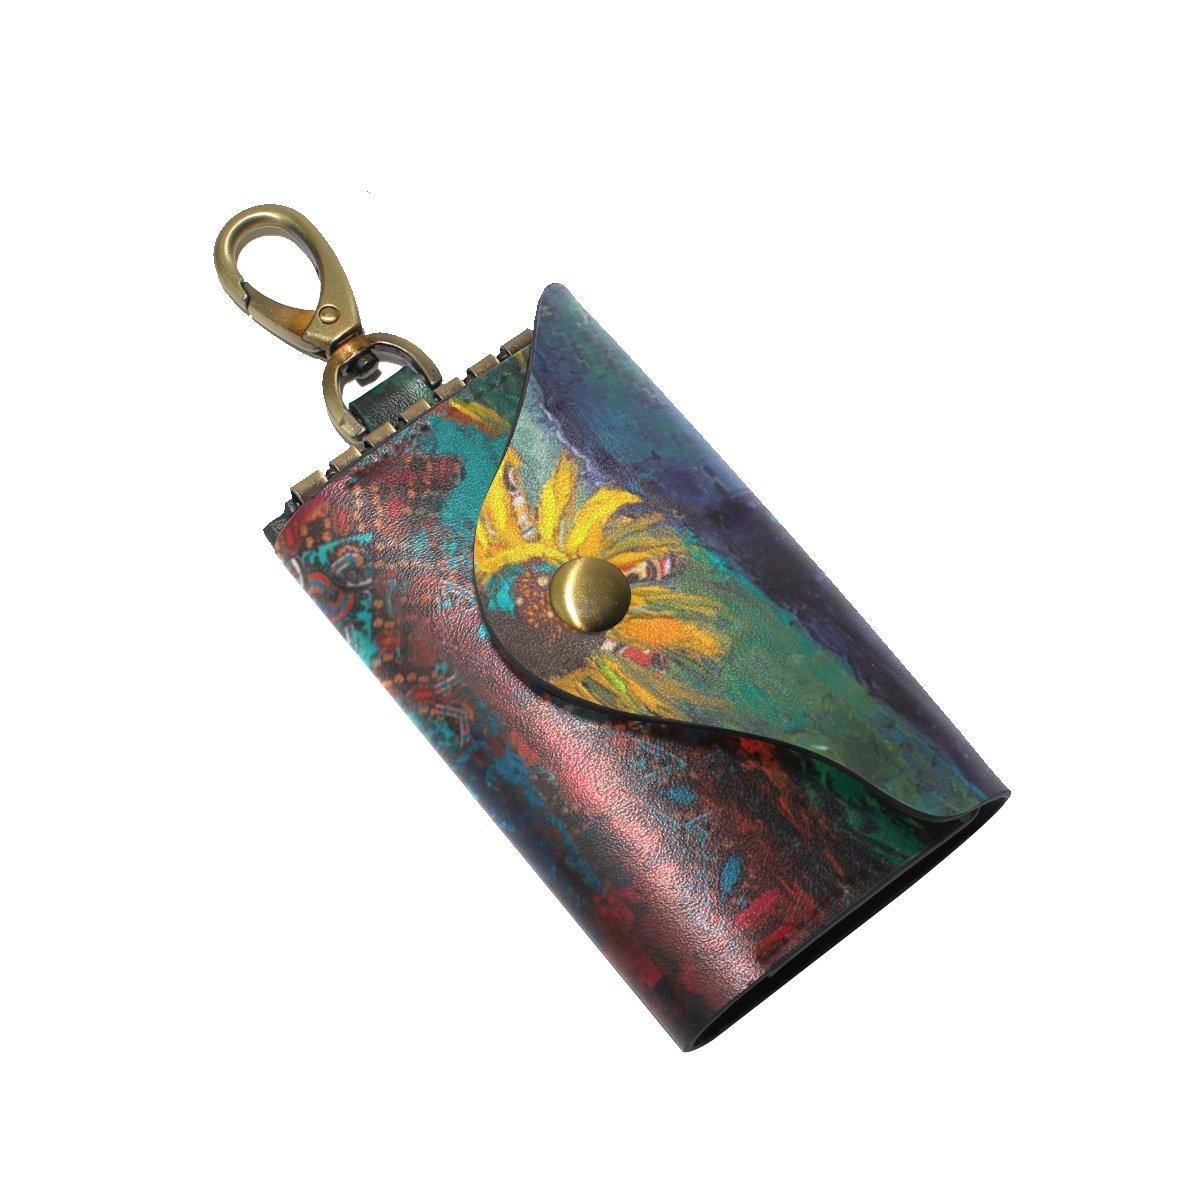 DEYYA Painting About Friendship Leather Key Case Wallets Unisex Keychain Key Holder with 6 Hooks Snap Closure